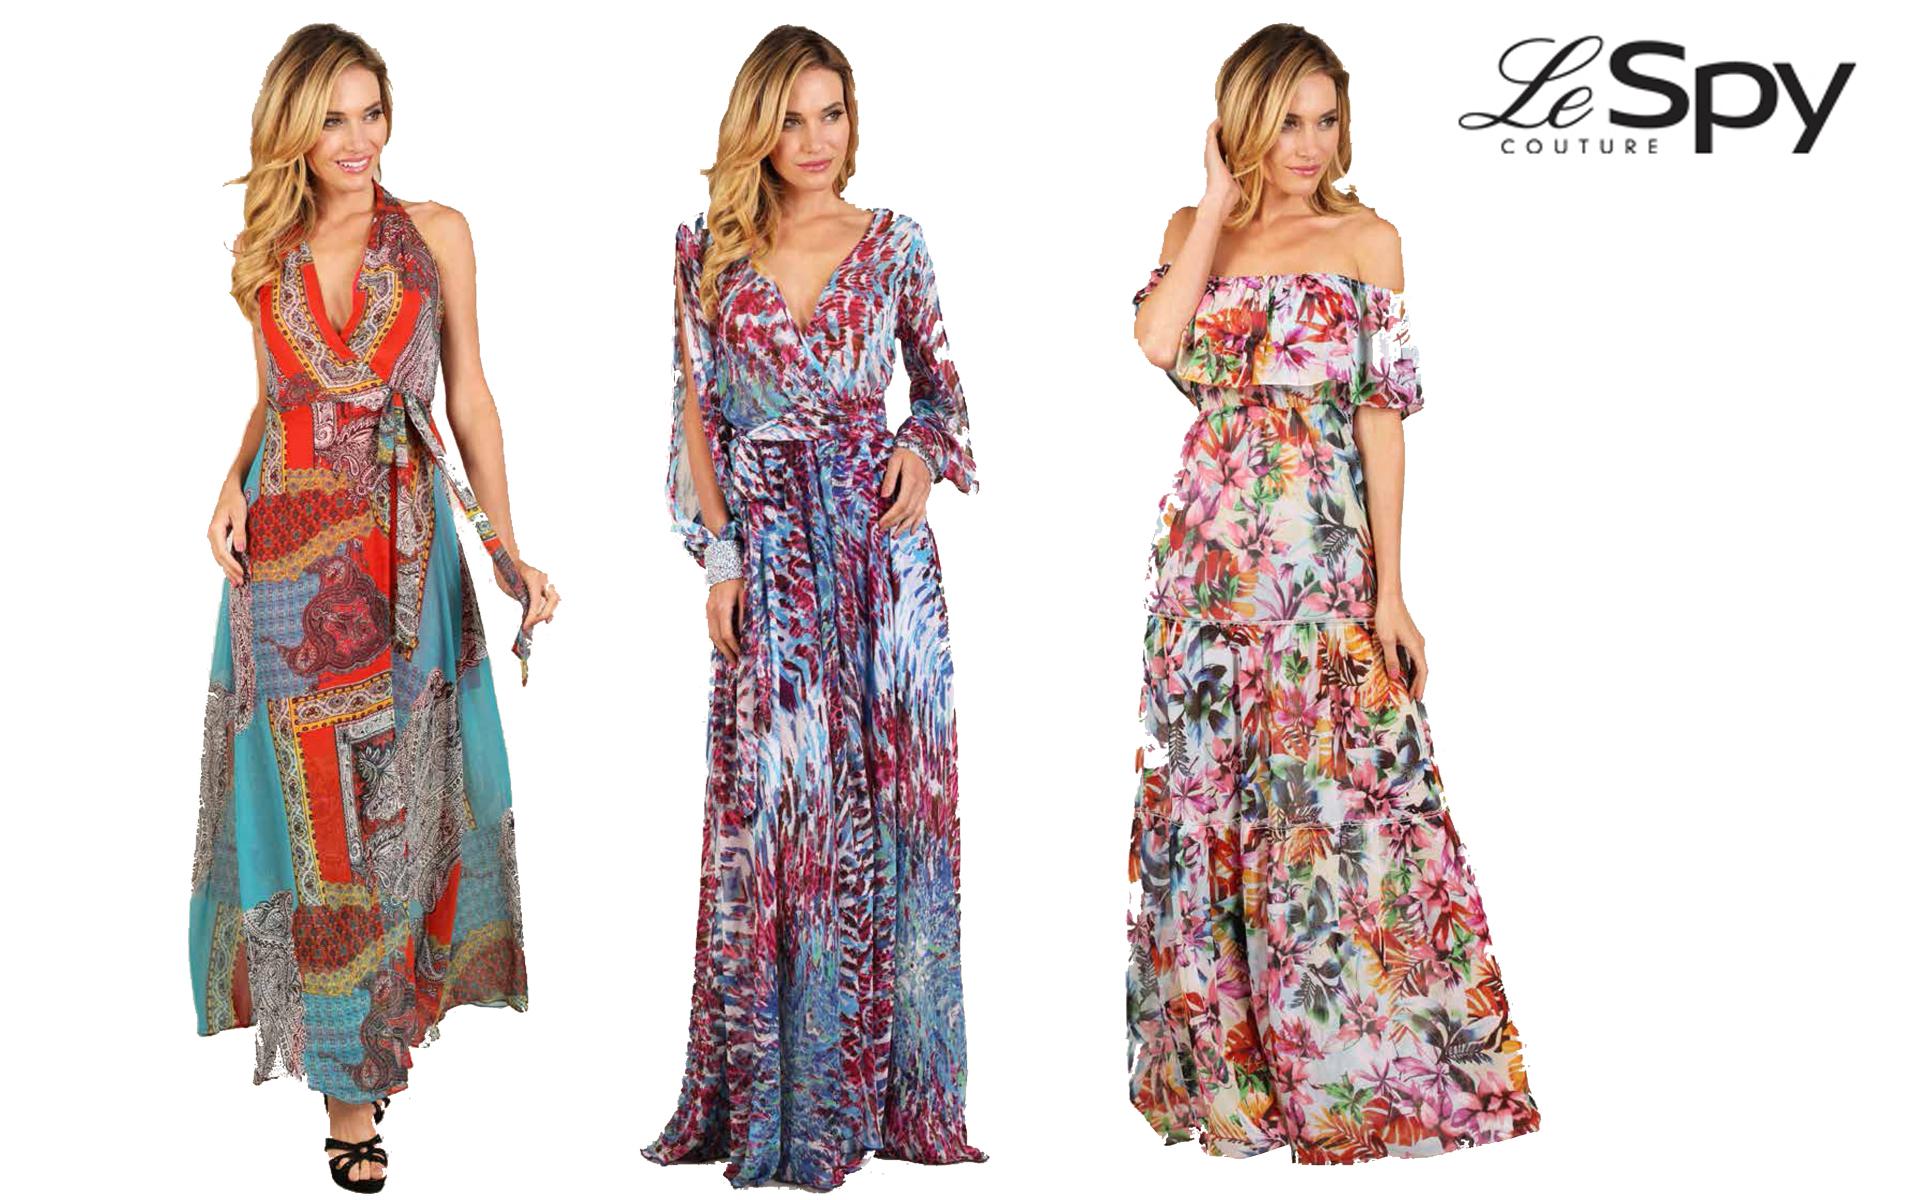 SPY DRESSES